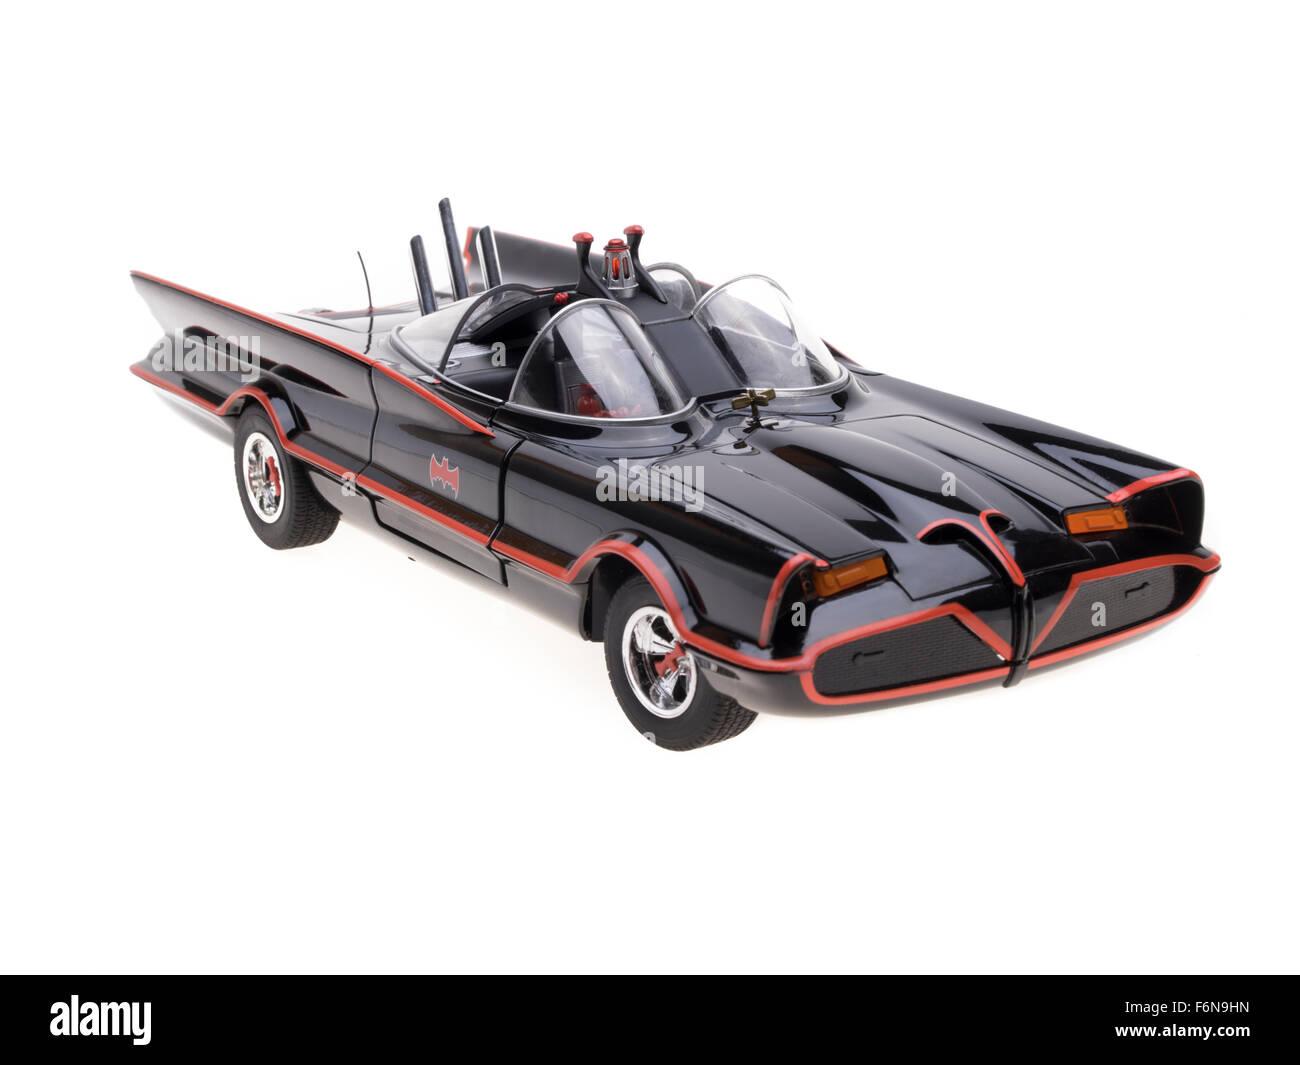 1966 TV Series Batmobile - Hot Wheels Toy - Stock Image